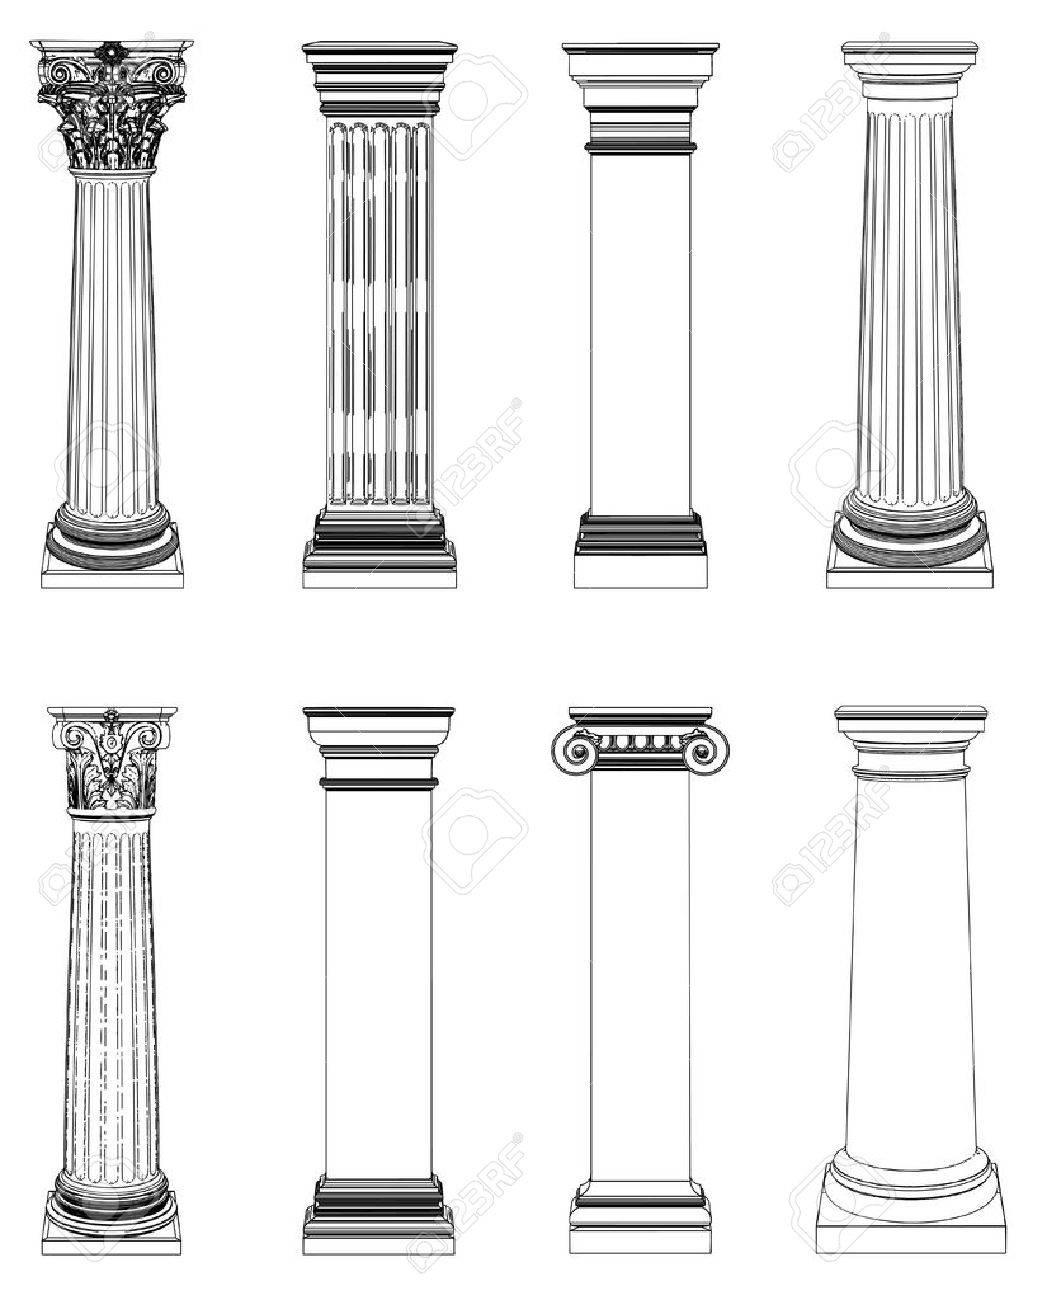 Single greek column isolated on white - 20331258